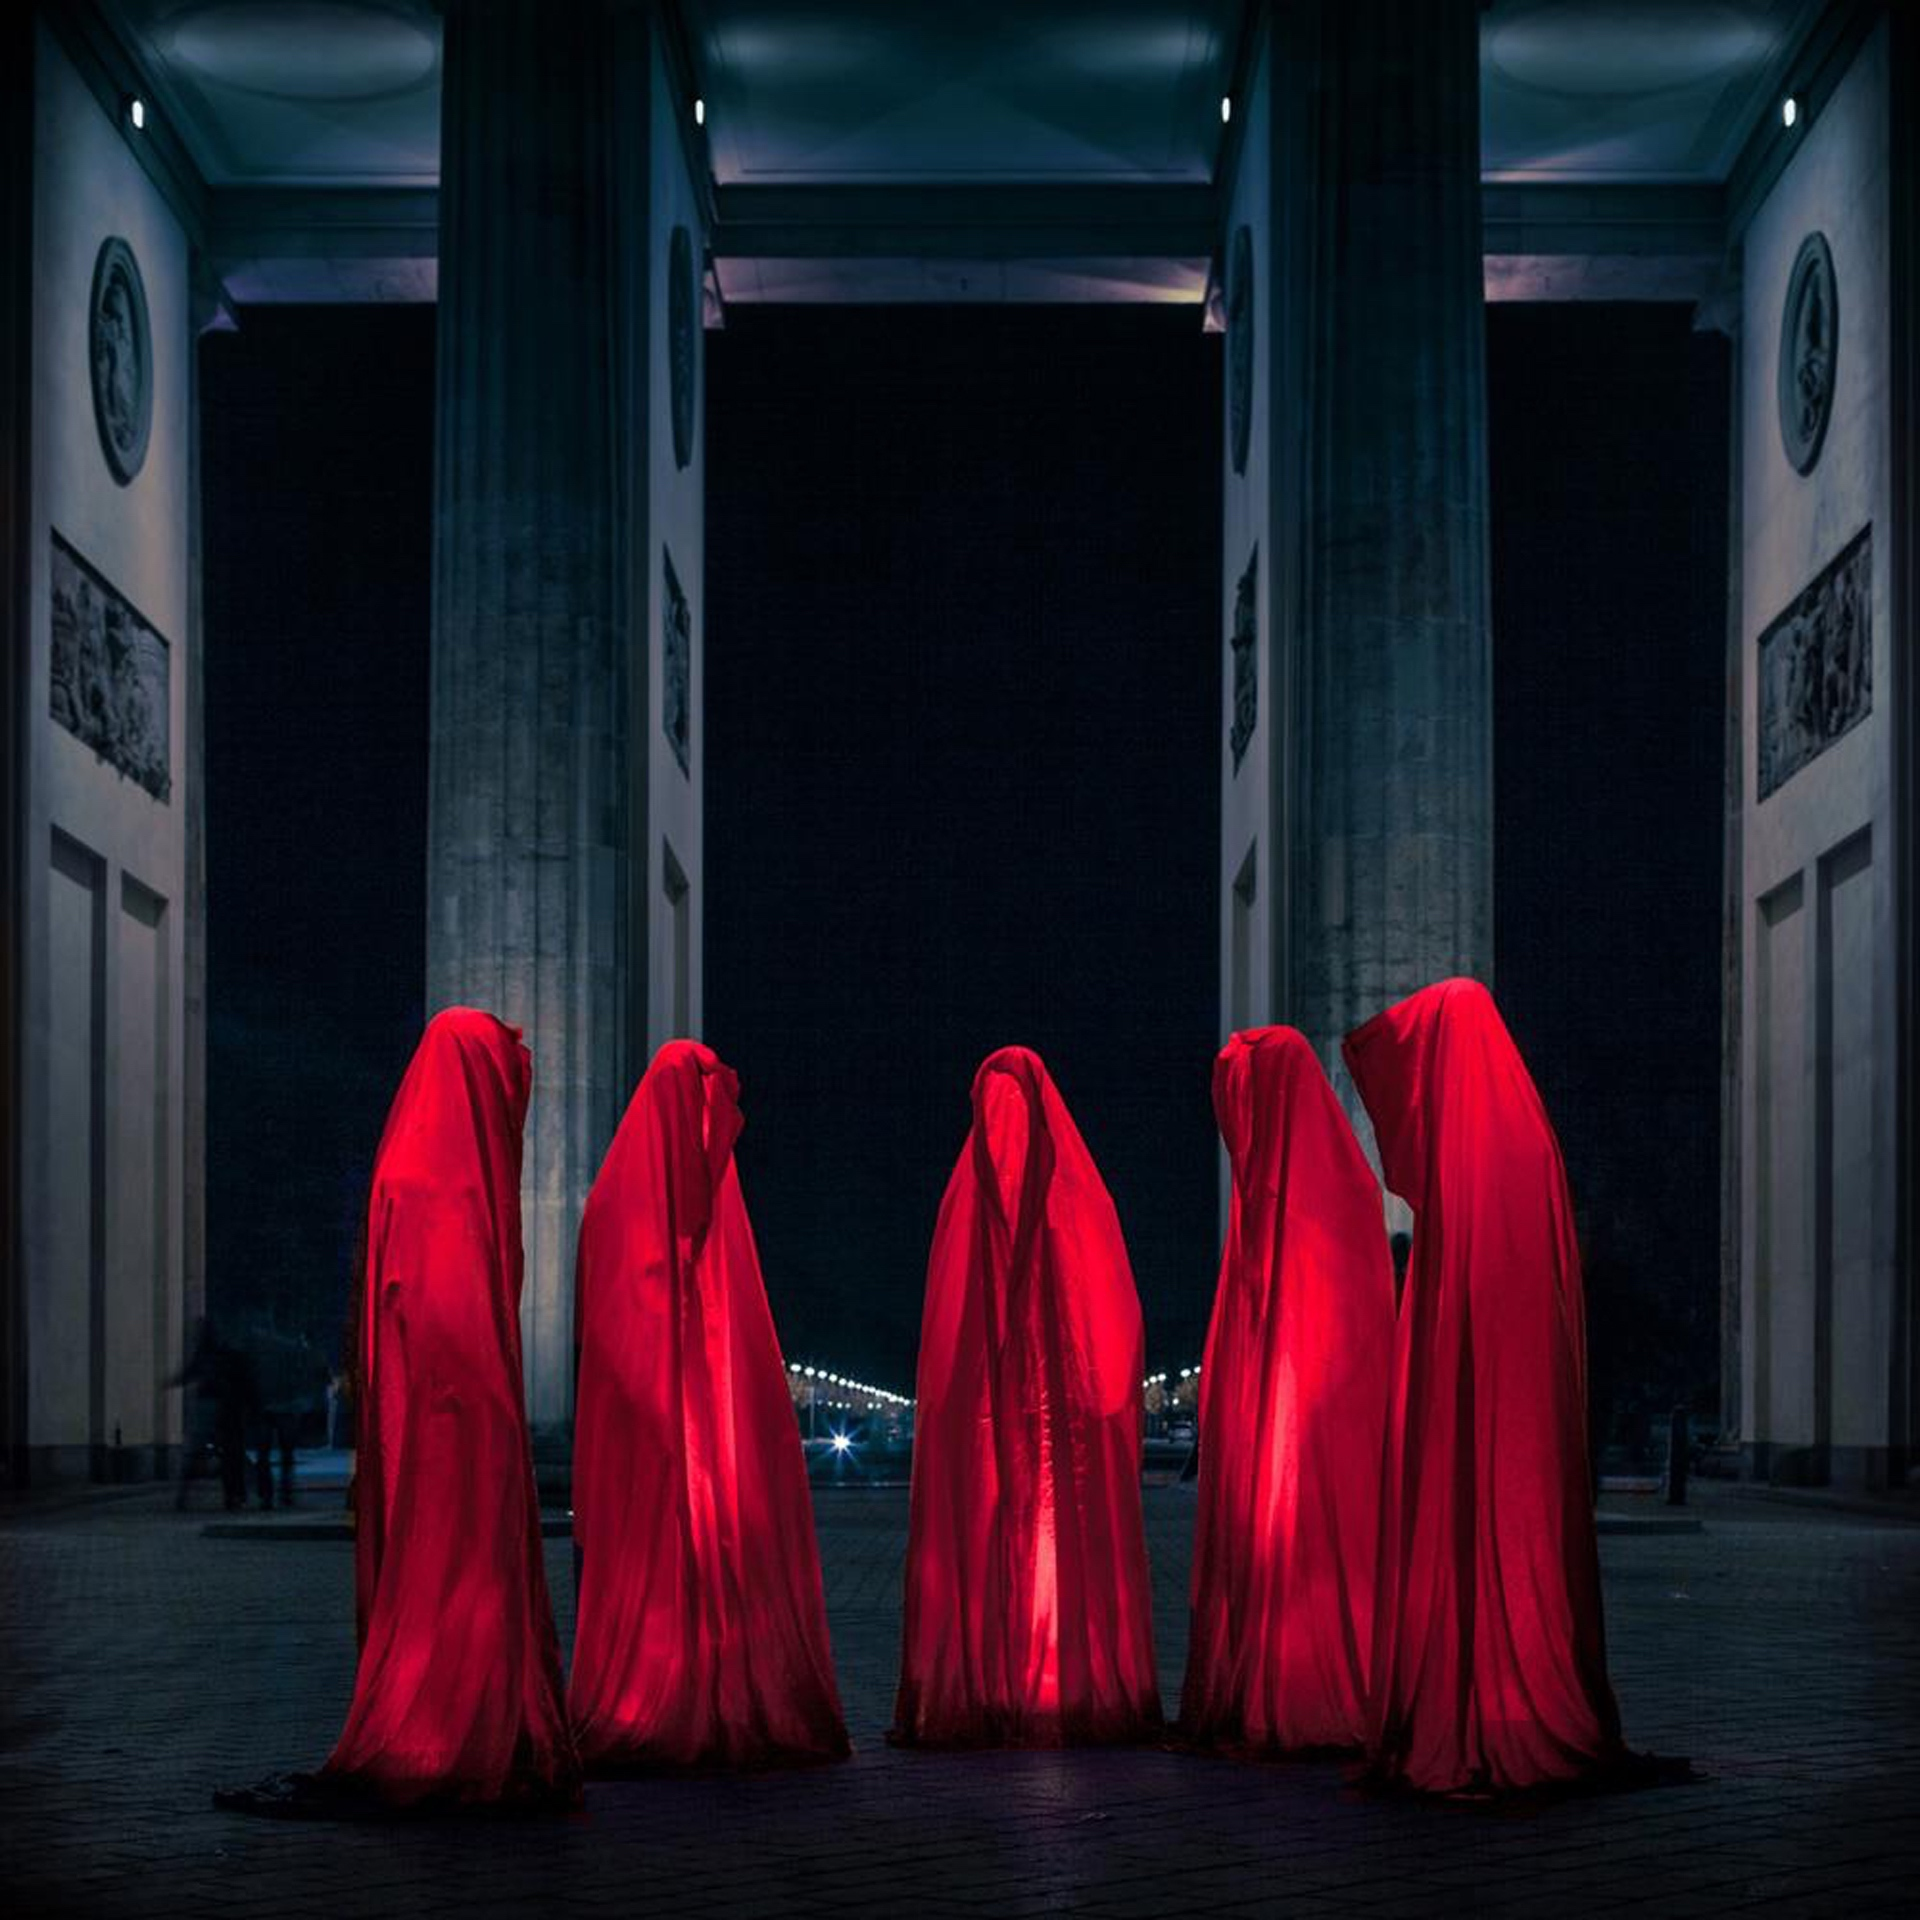 Faceless I (2013) by Markus Studtmann - Pako Campo